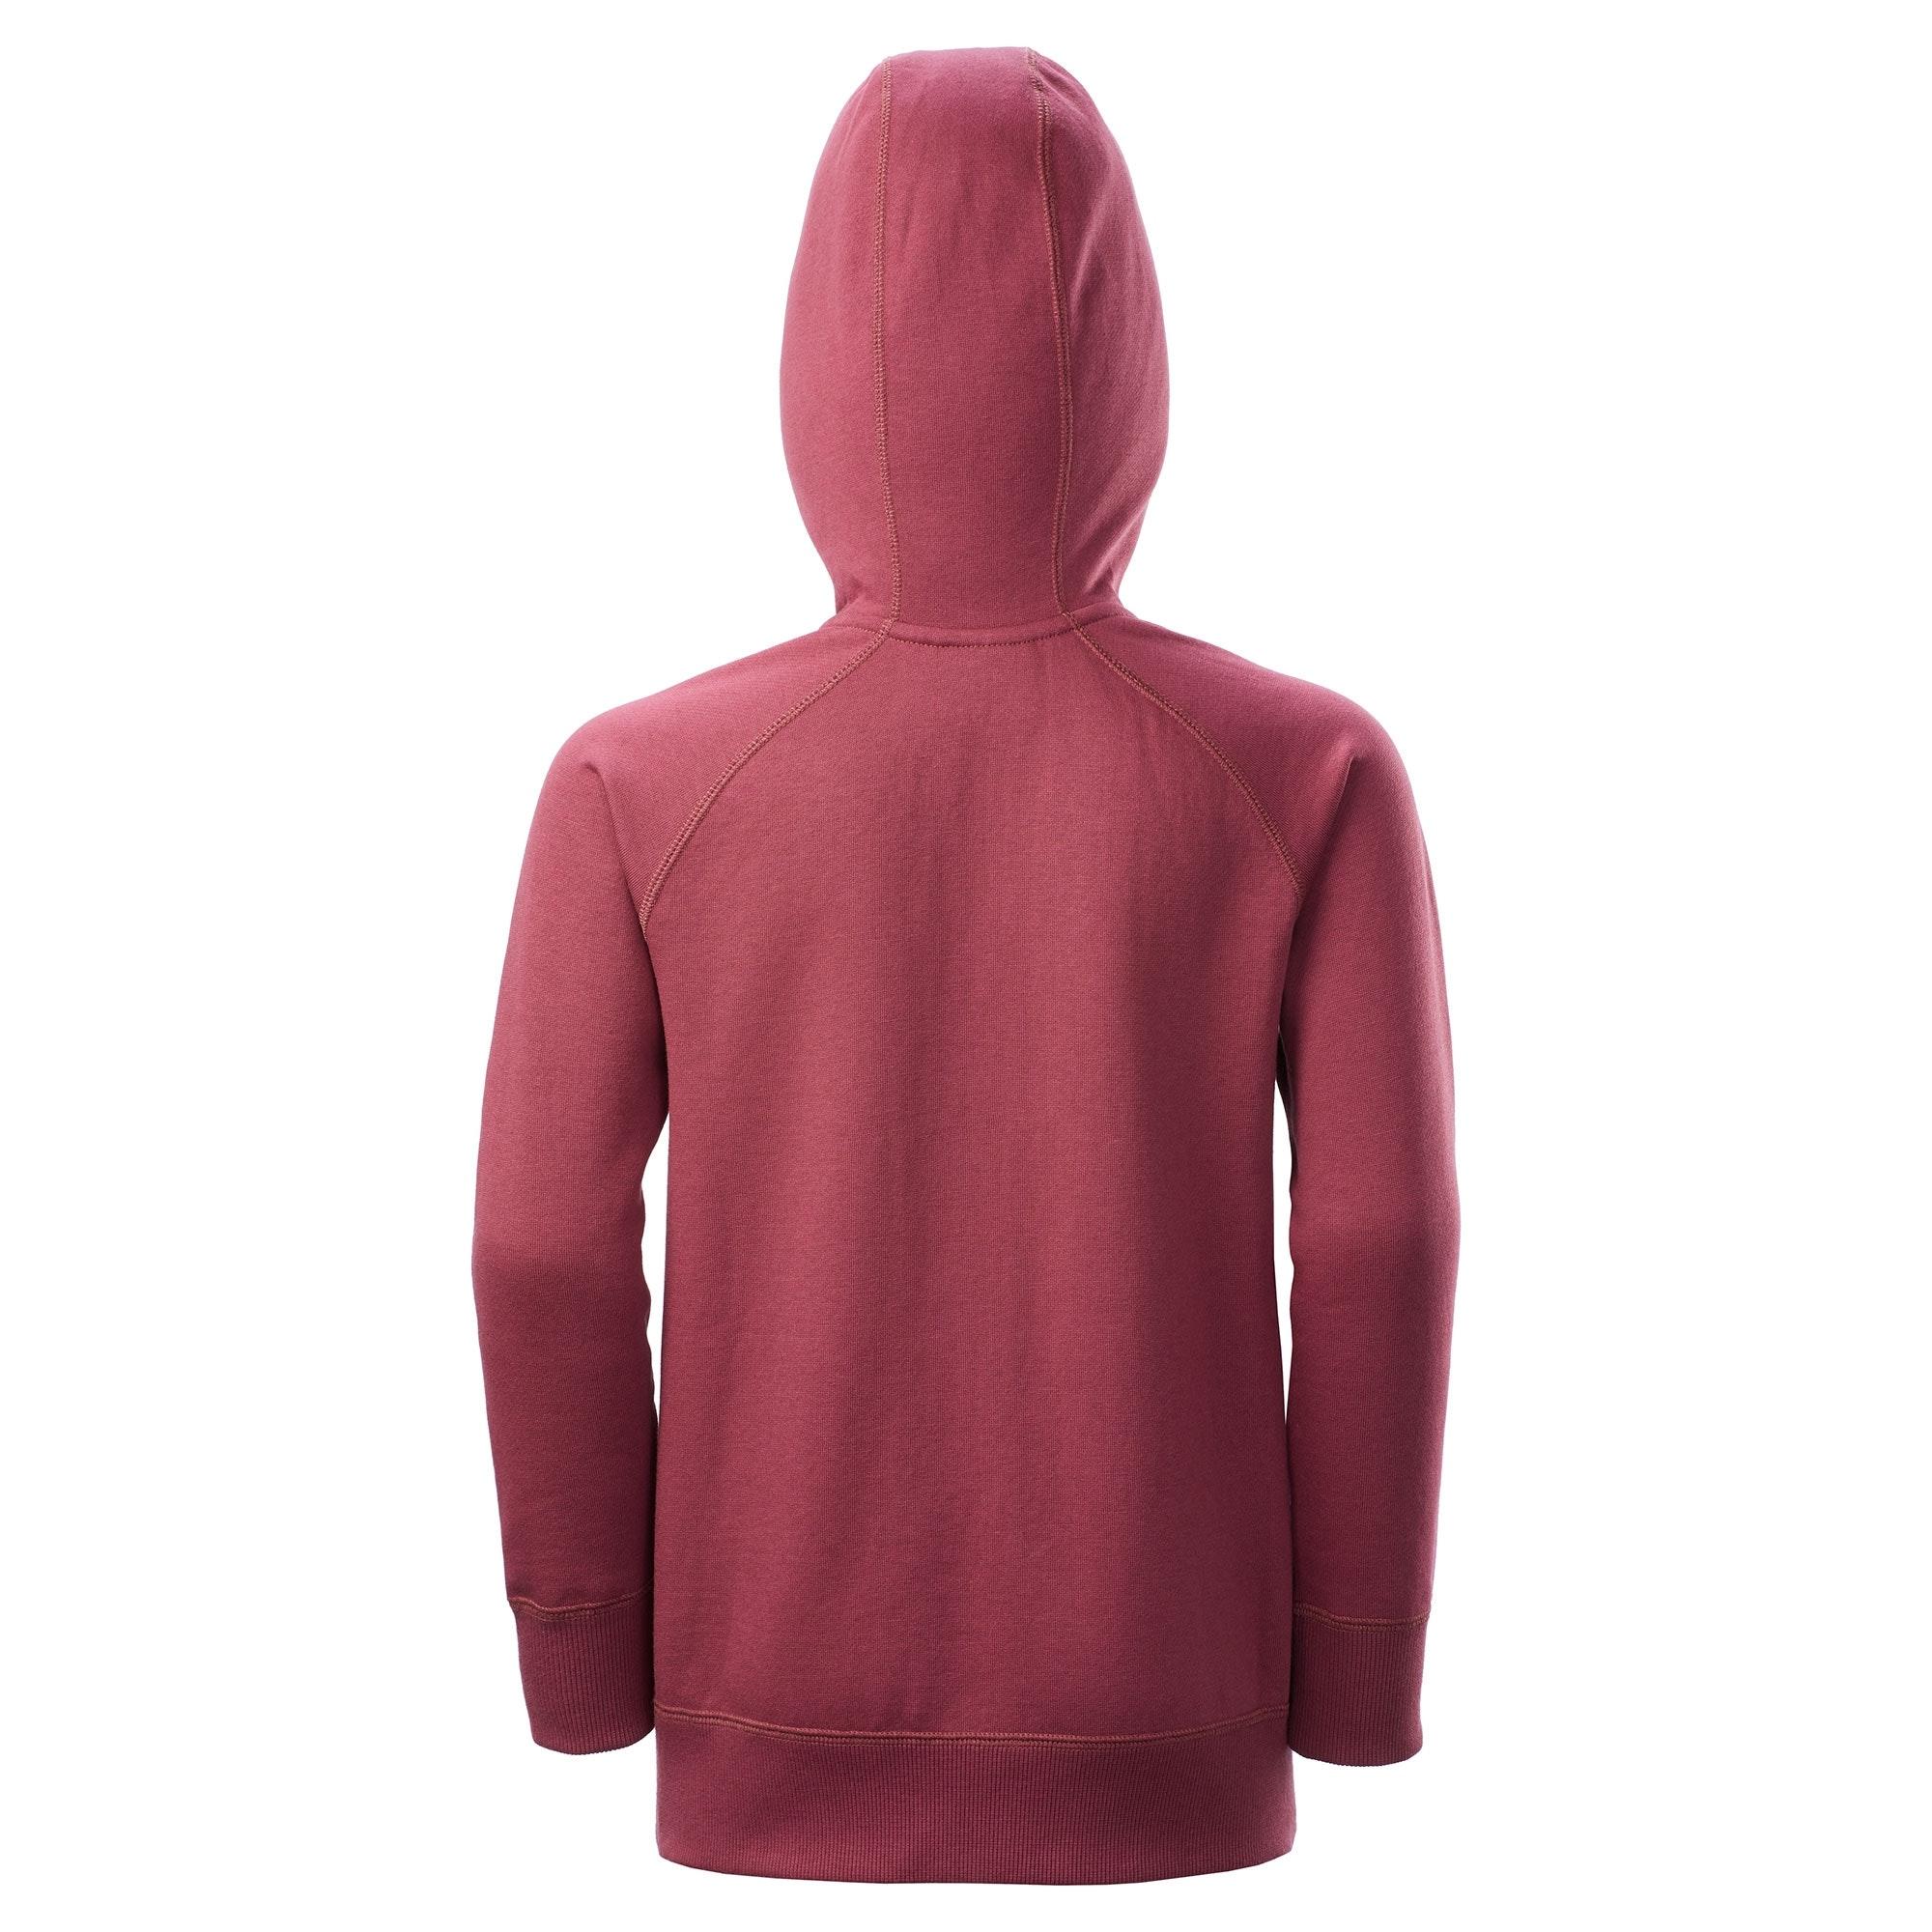 NEW-Kathmandu-Youth-Boy-039-s-Girl-039-s-Full-Zip-Hooded-Winter-Warm-Fleece-Jacket thumbnail 23